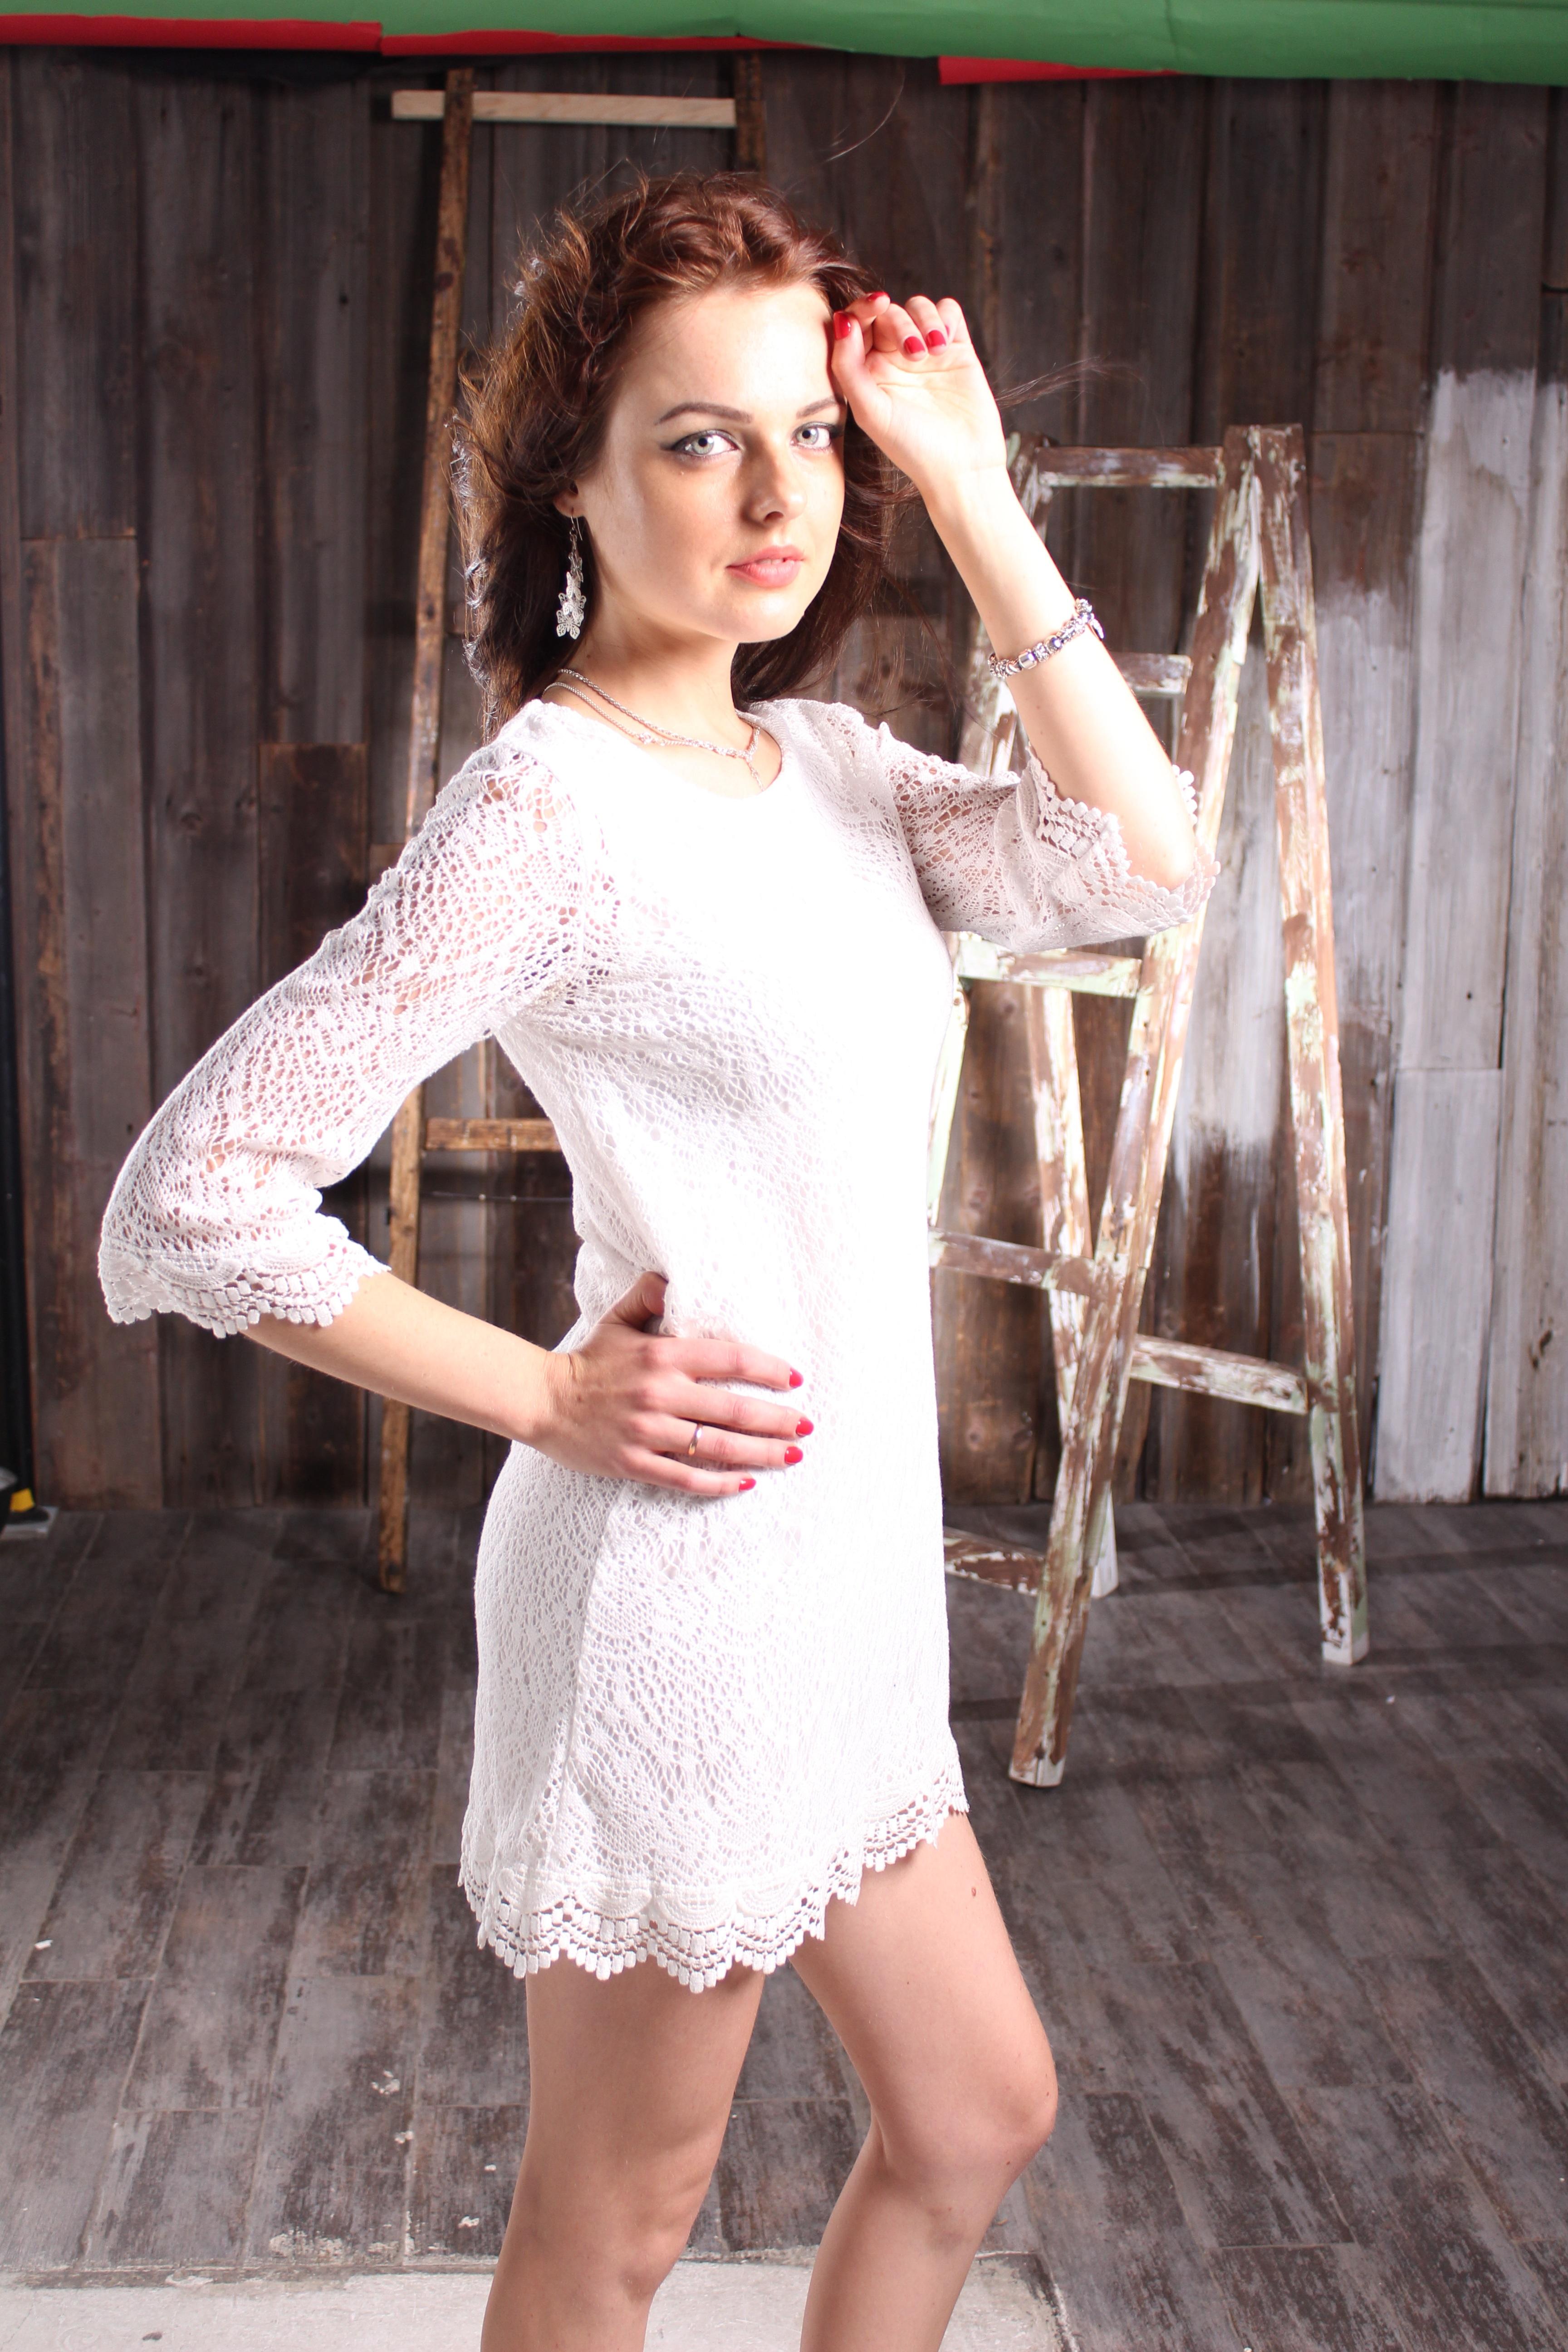 Leg Model Spring Fashion Clothing Wedding Dress Human Body Dress Sexy Photoshoot Gown Beautiful Girl Abdomen